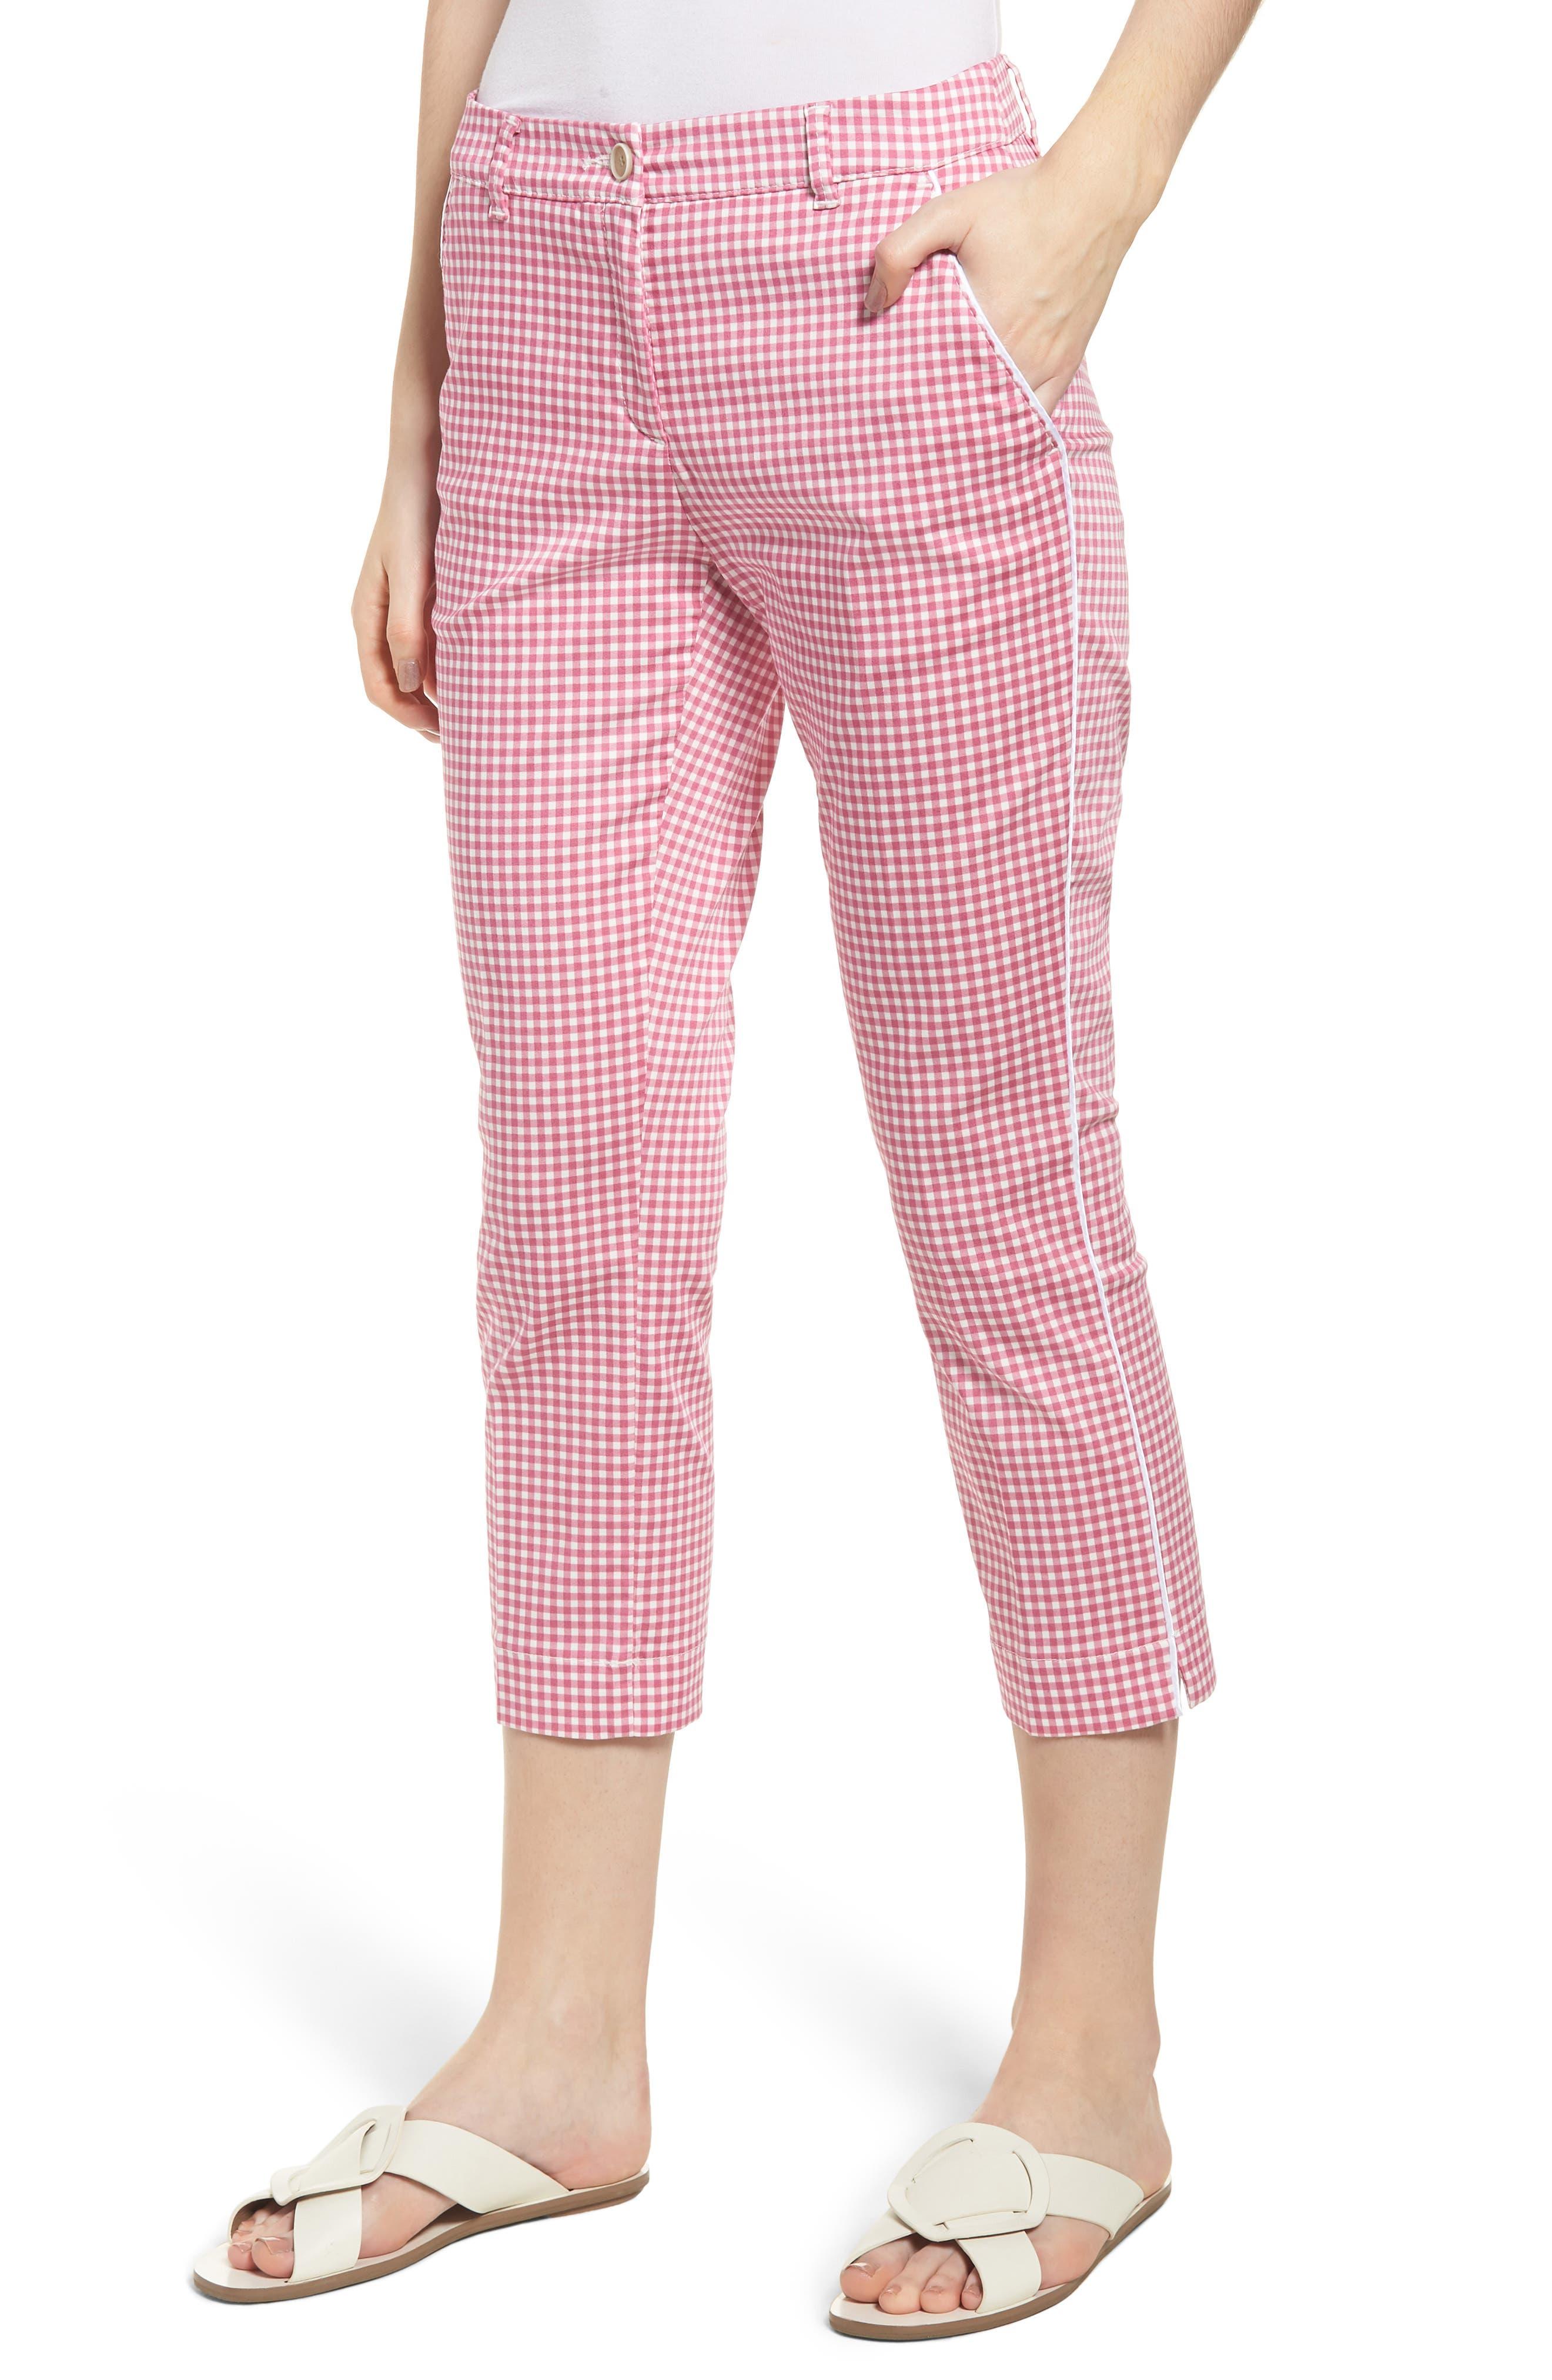 Maron Gingham Stretch Cotton Pants,                             Main thumbnail 1, color,                             Pink